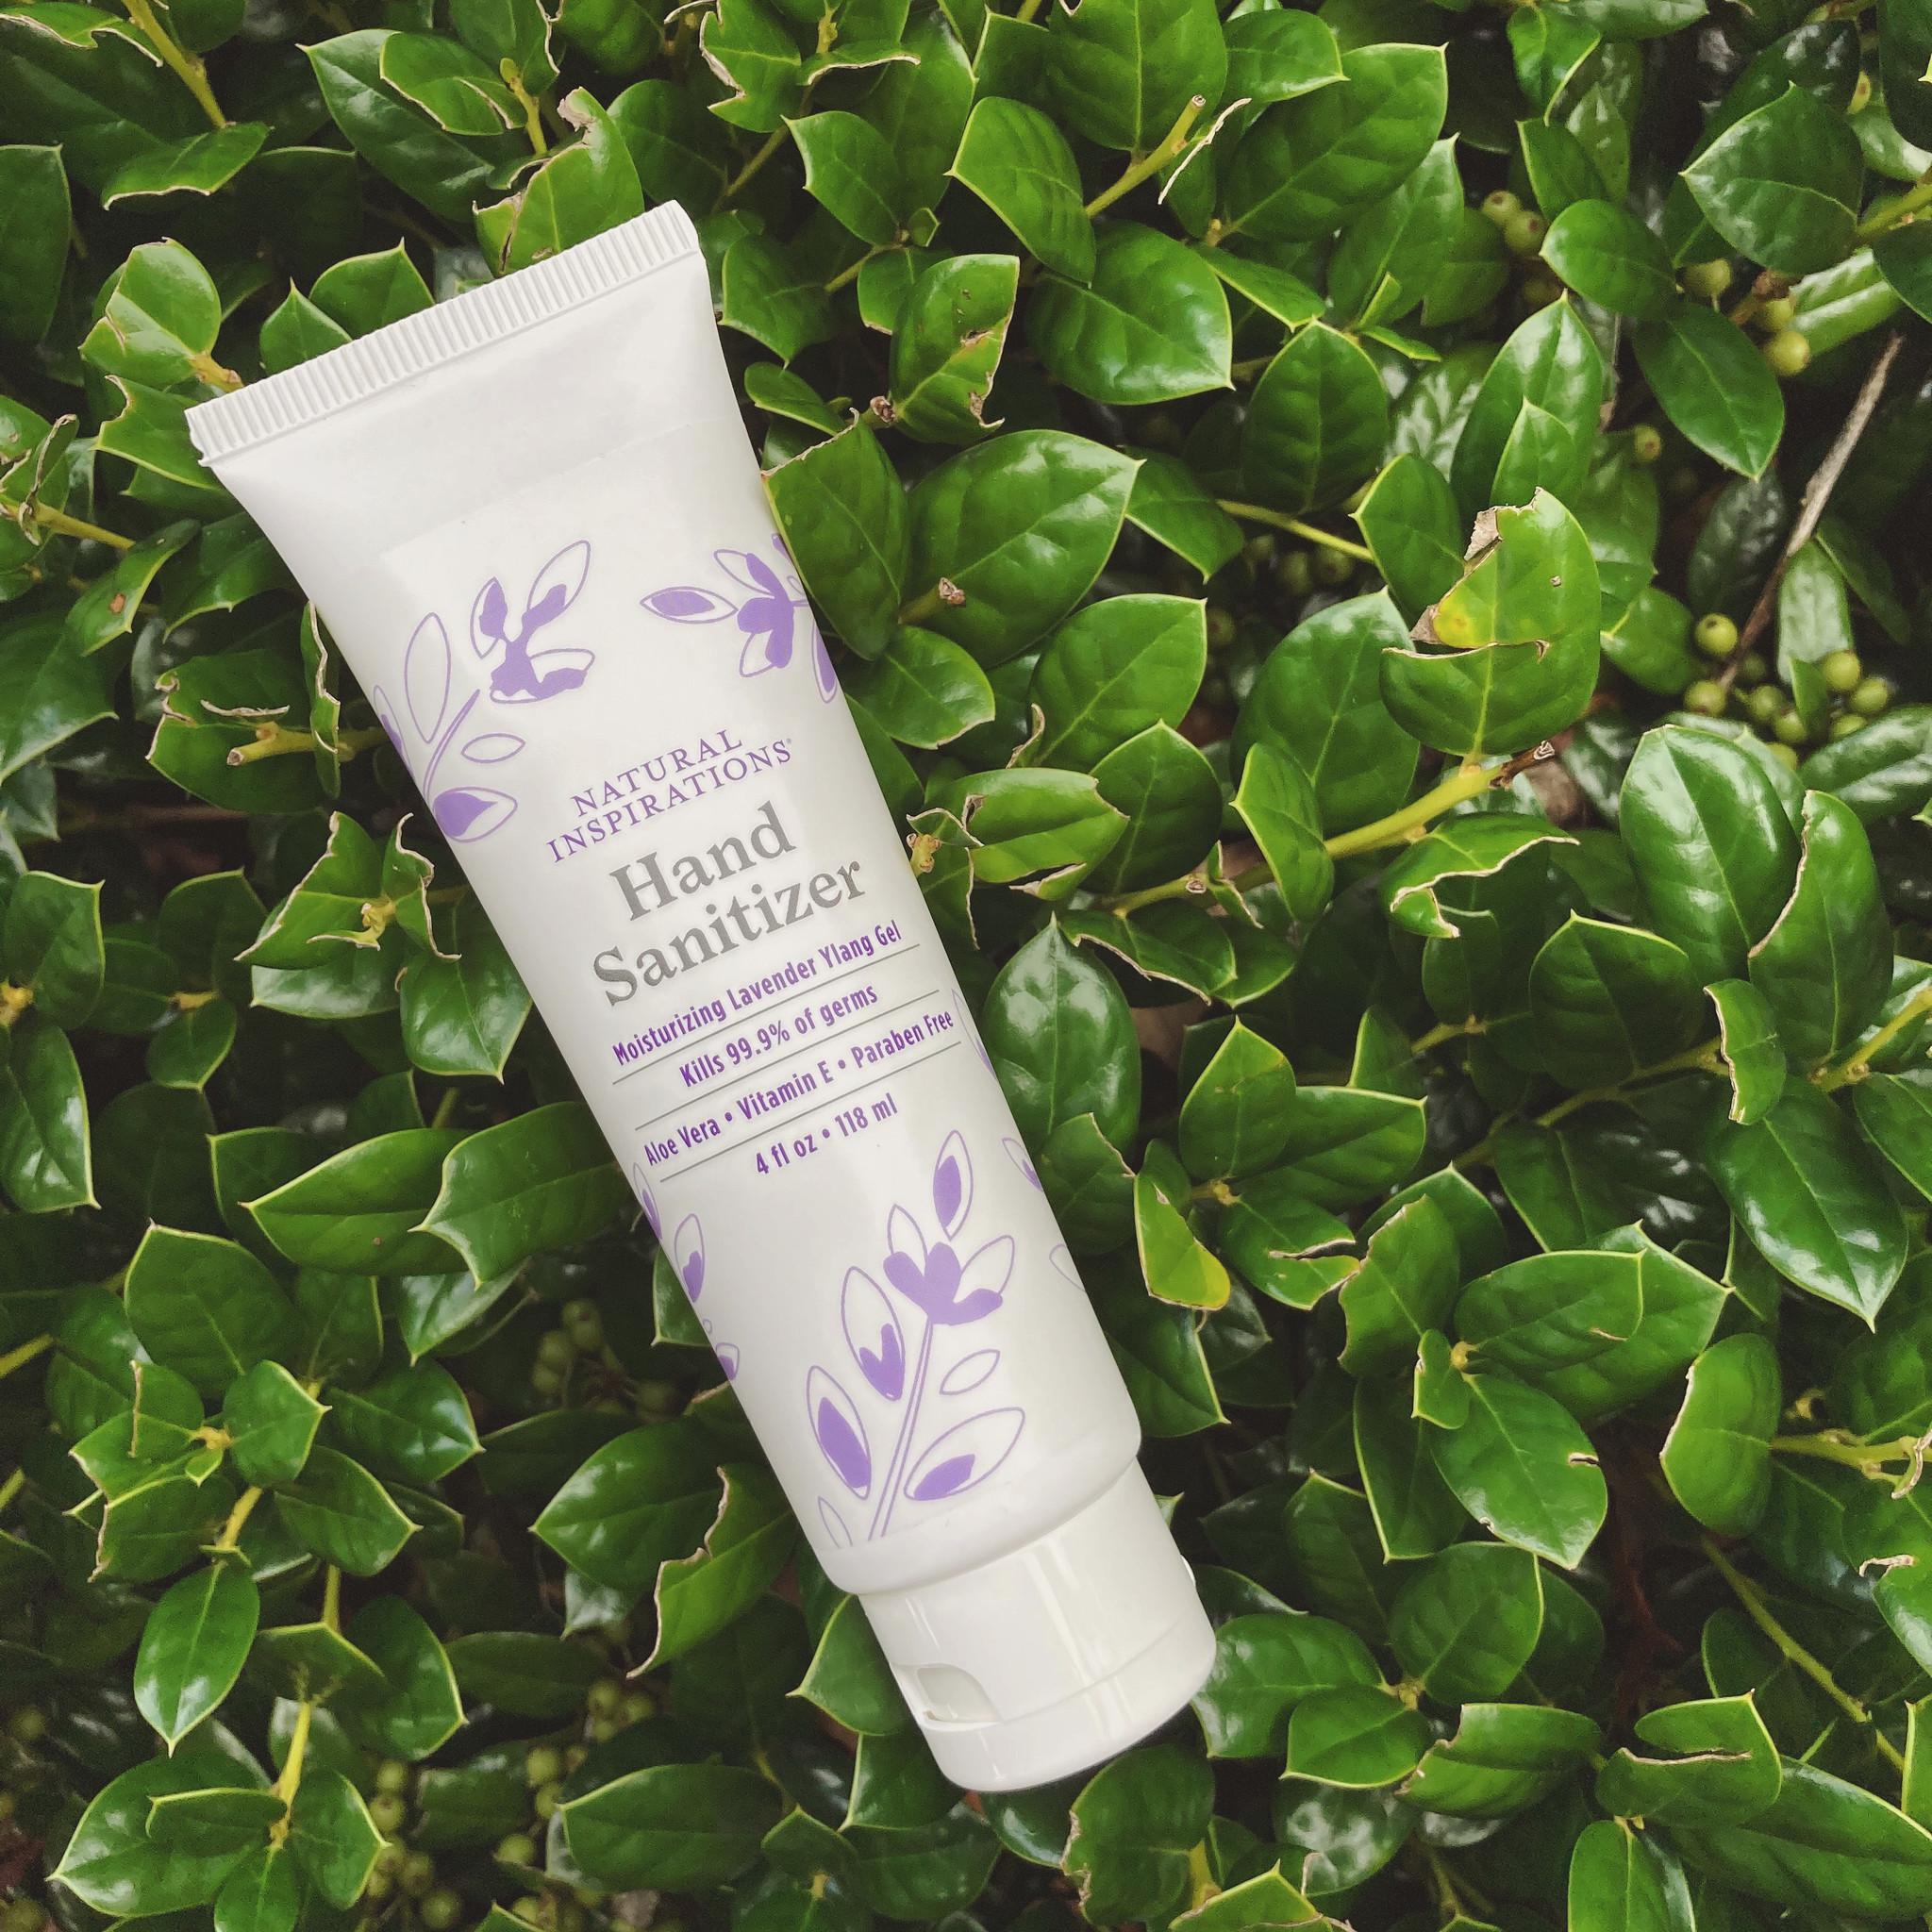 Natural Inspirations Lavender Ylang Hand Sanitizer